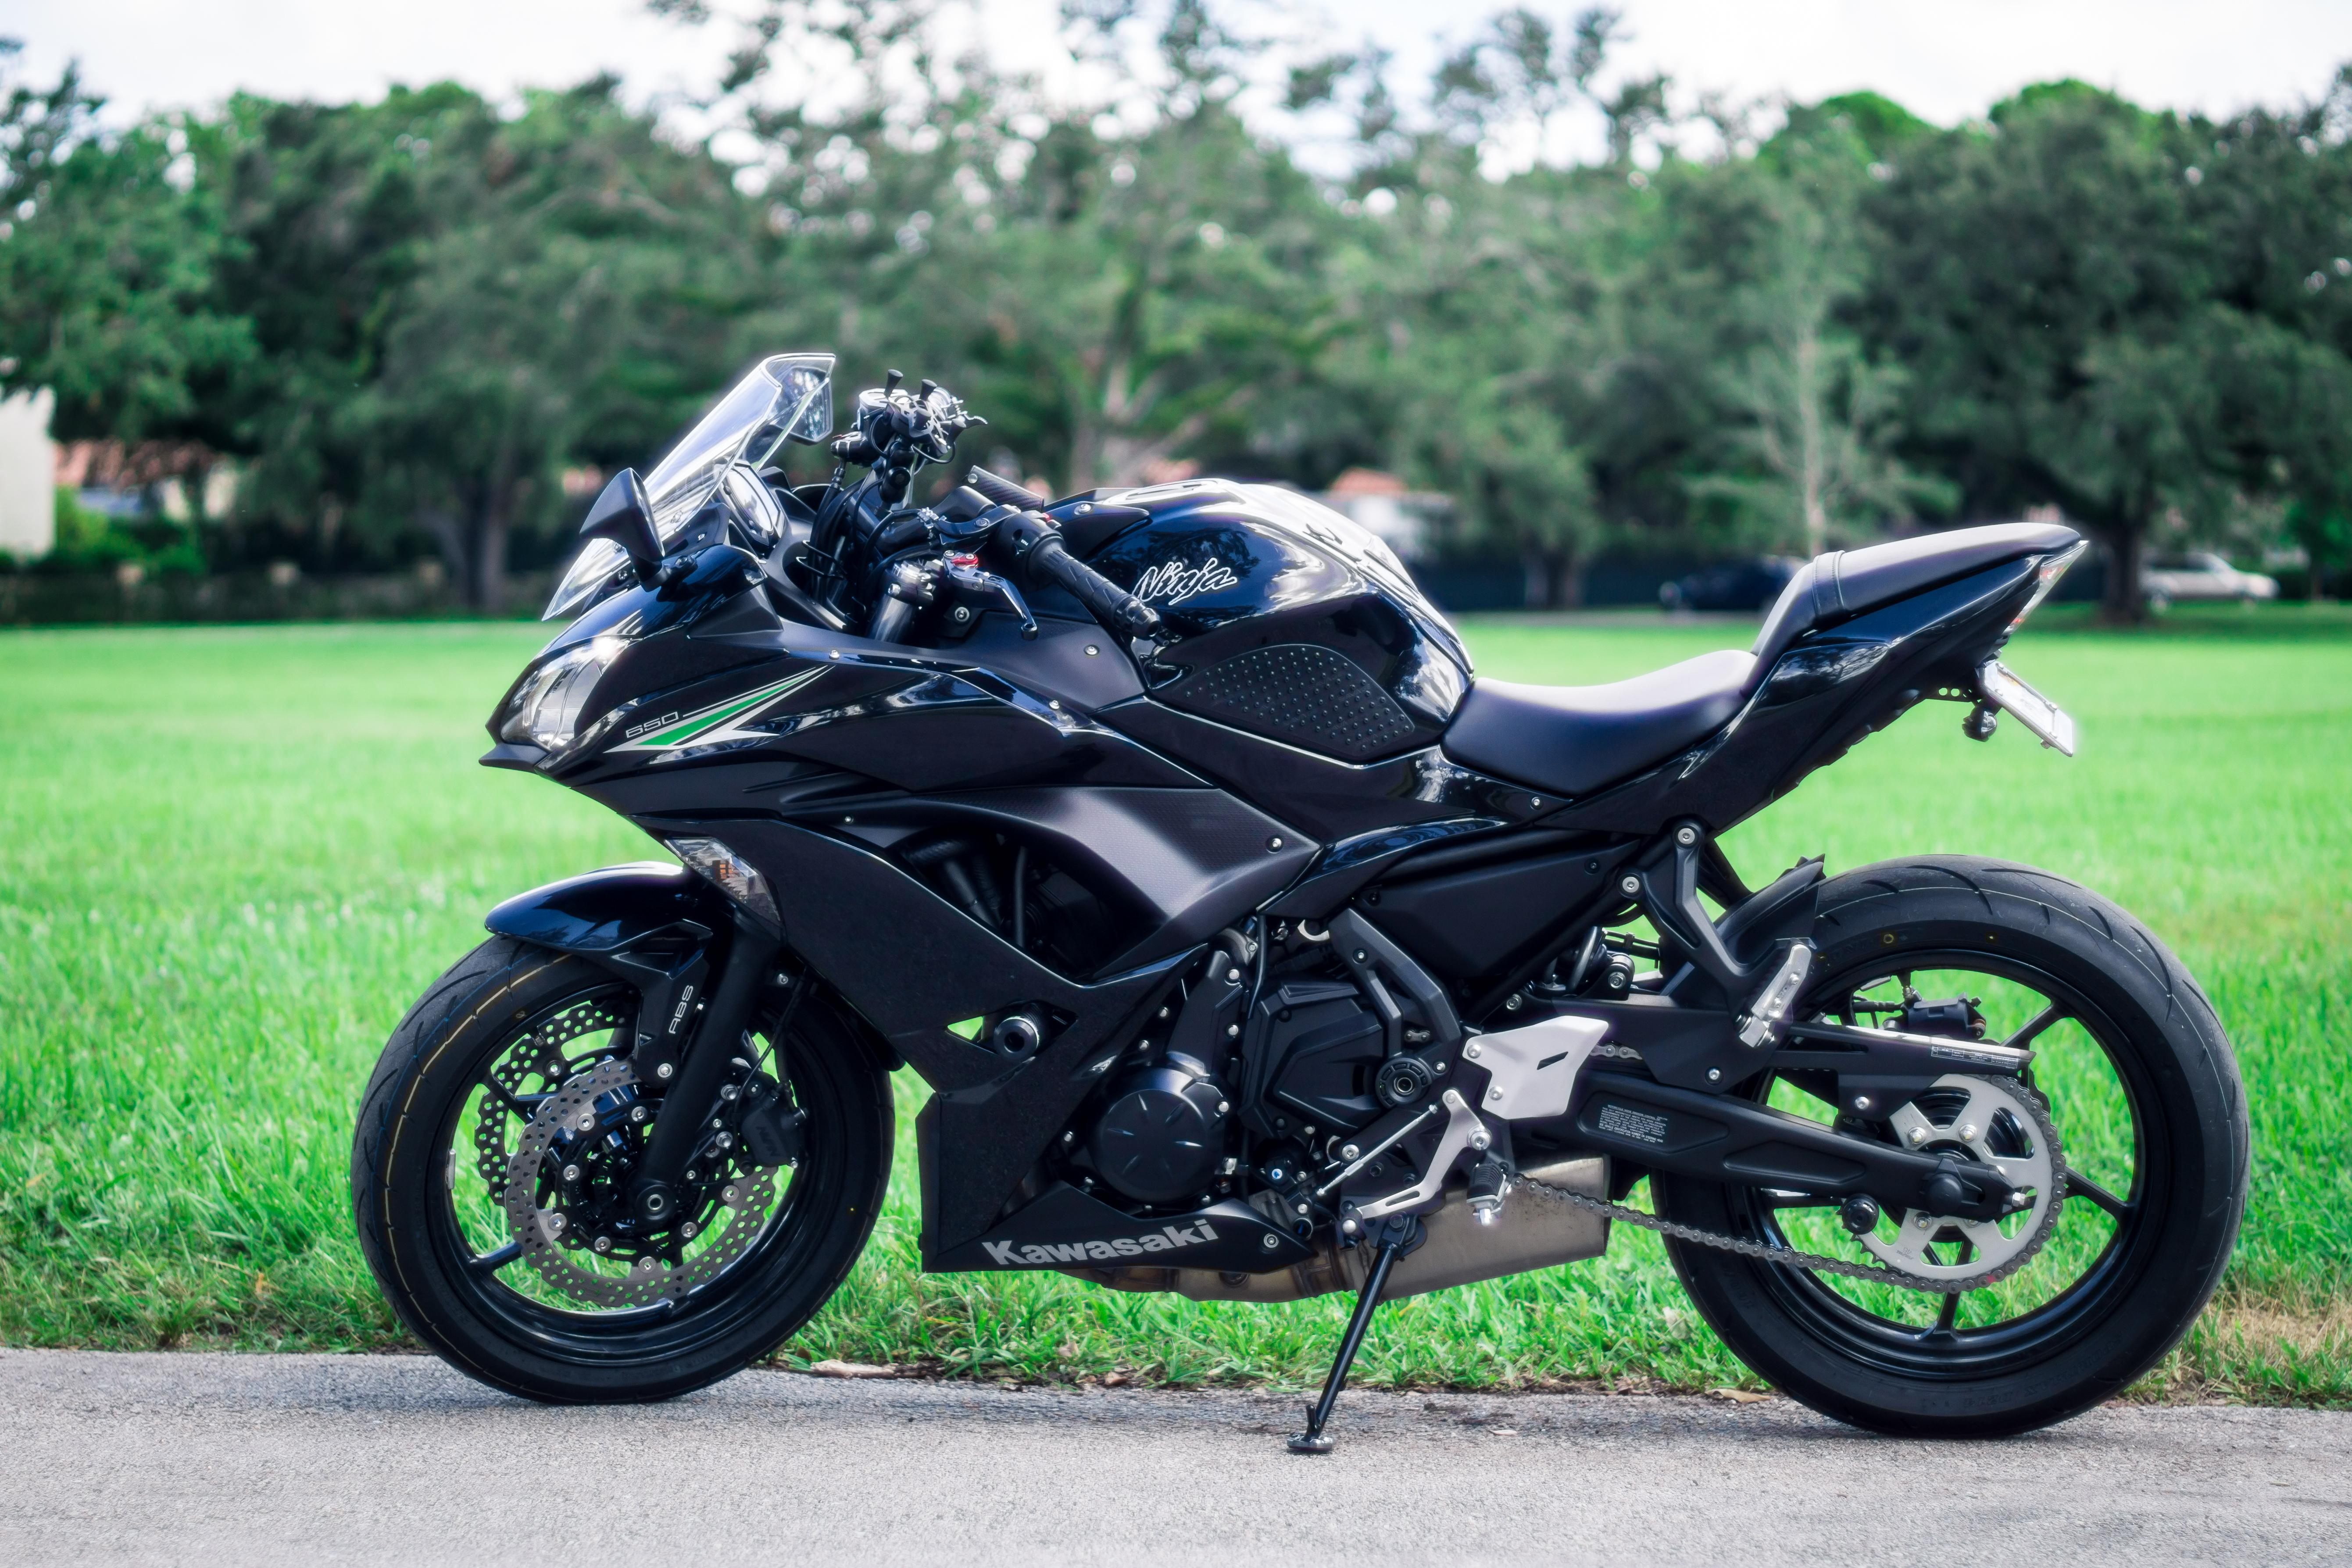 Picture of Sportbike Smartphone Ram Mount - 2017 Kawasaki Ninja 650 ABS